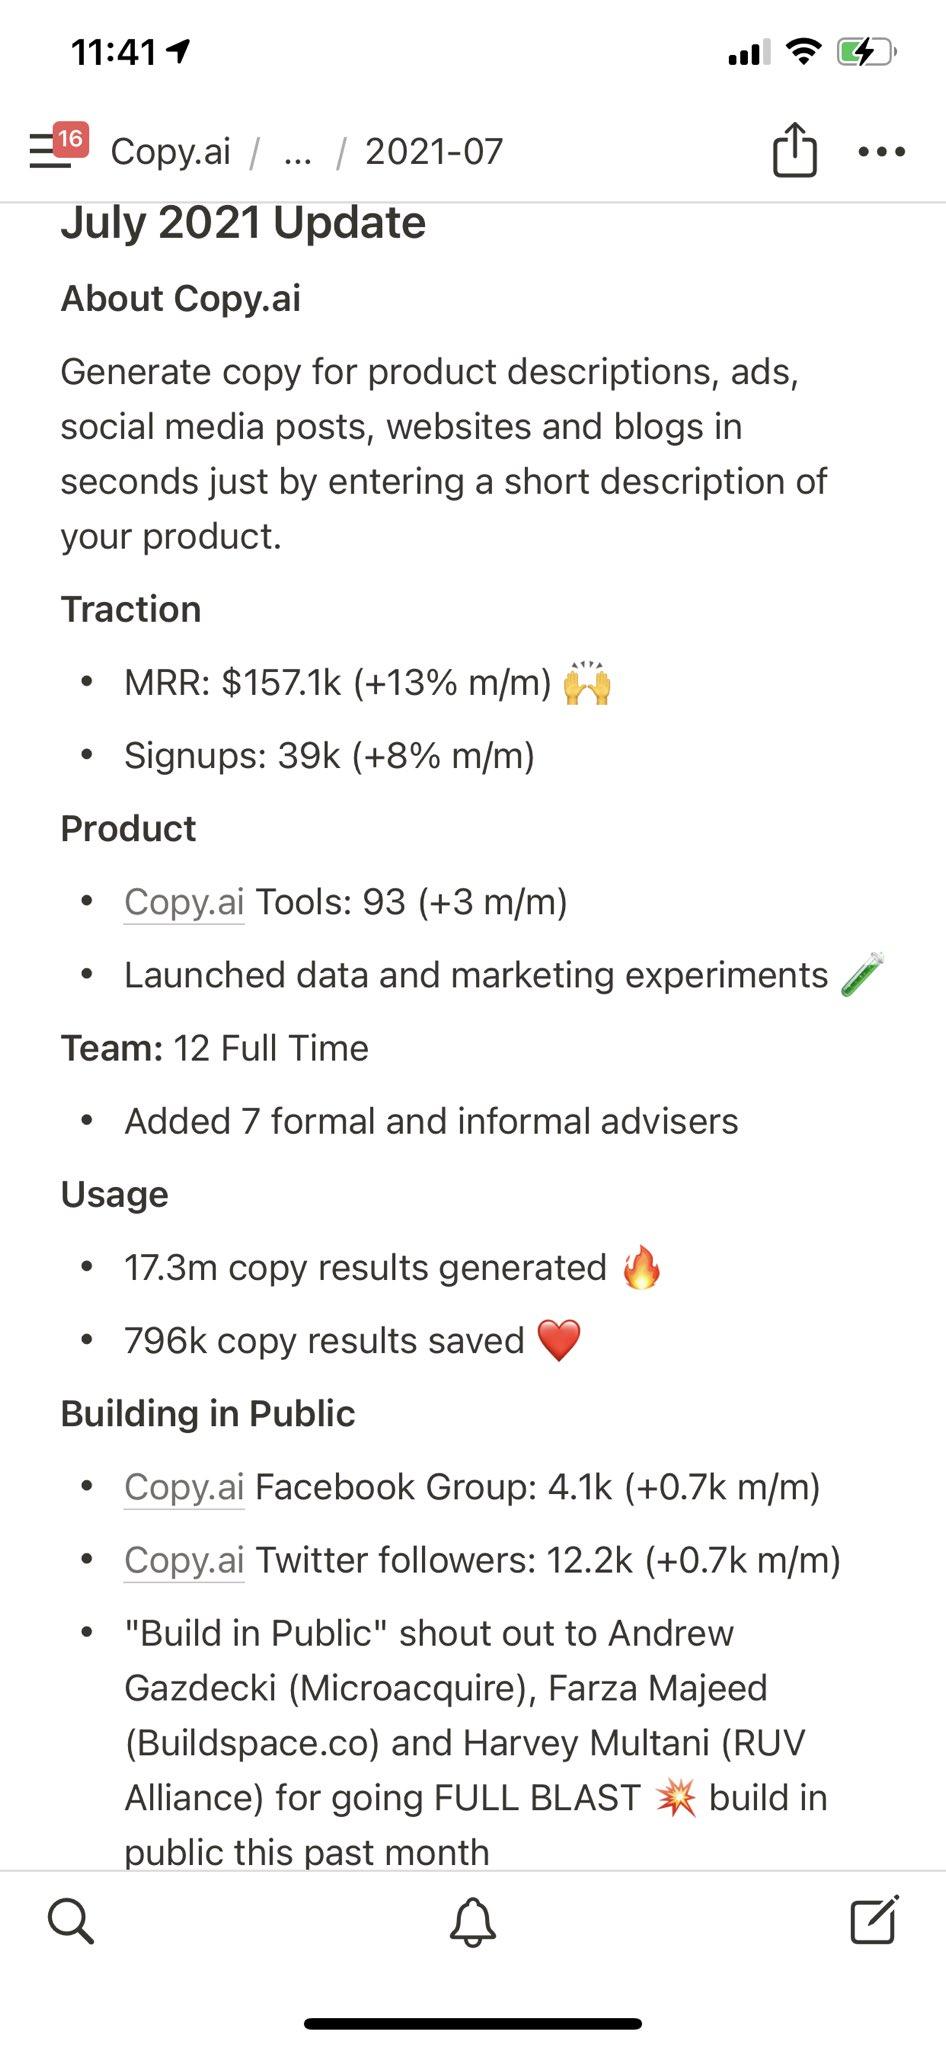 CopyAI monthly update